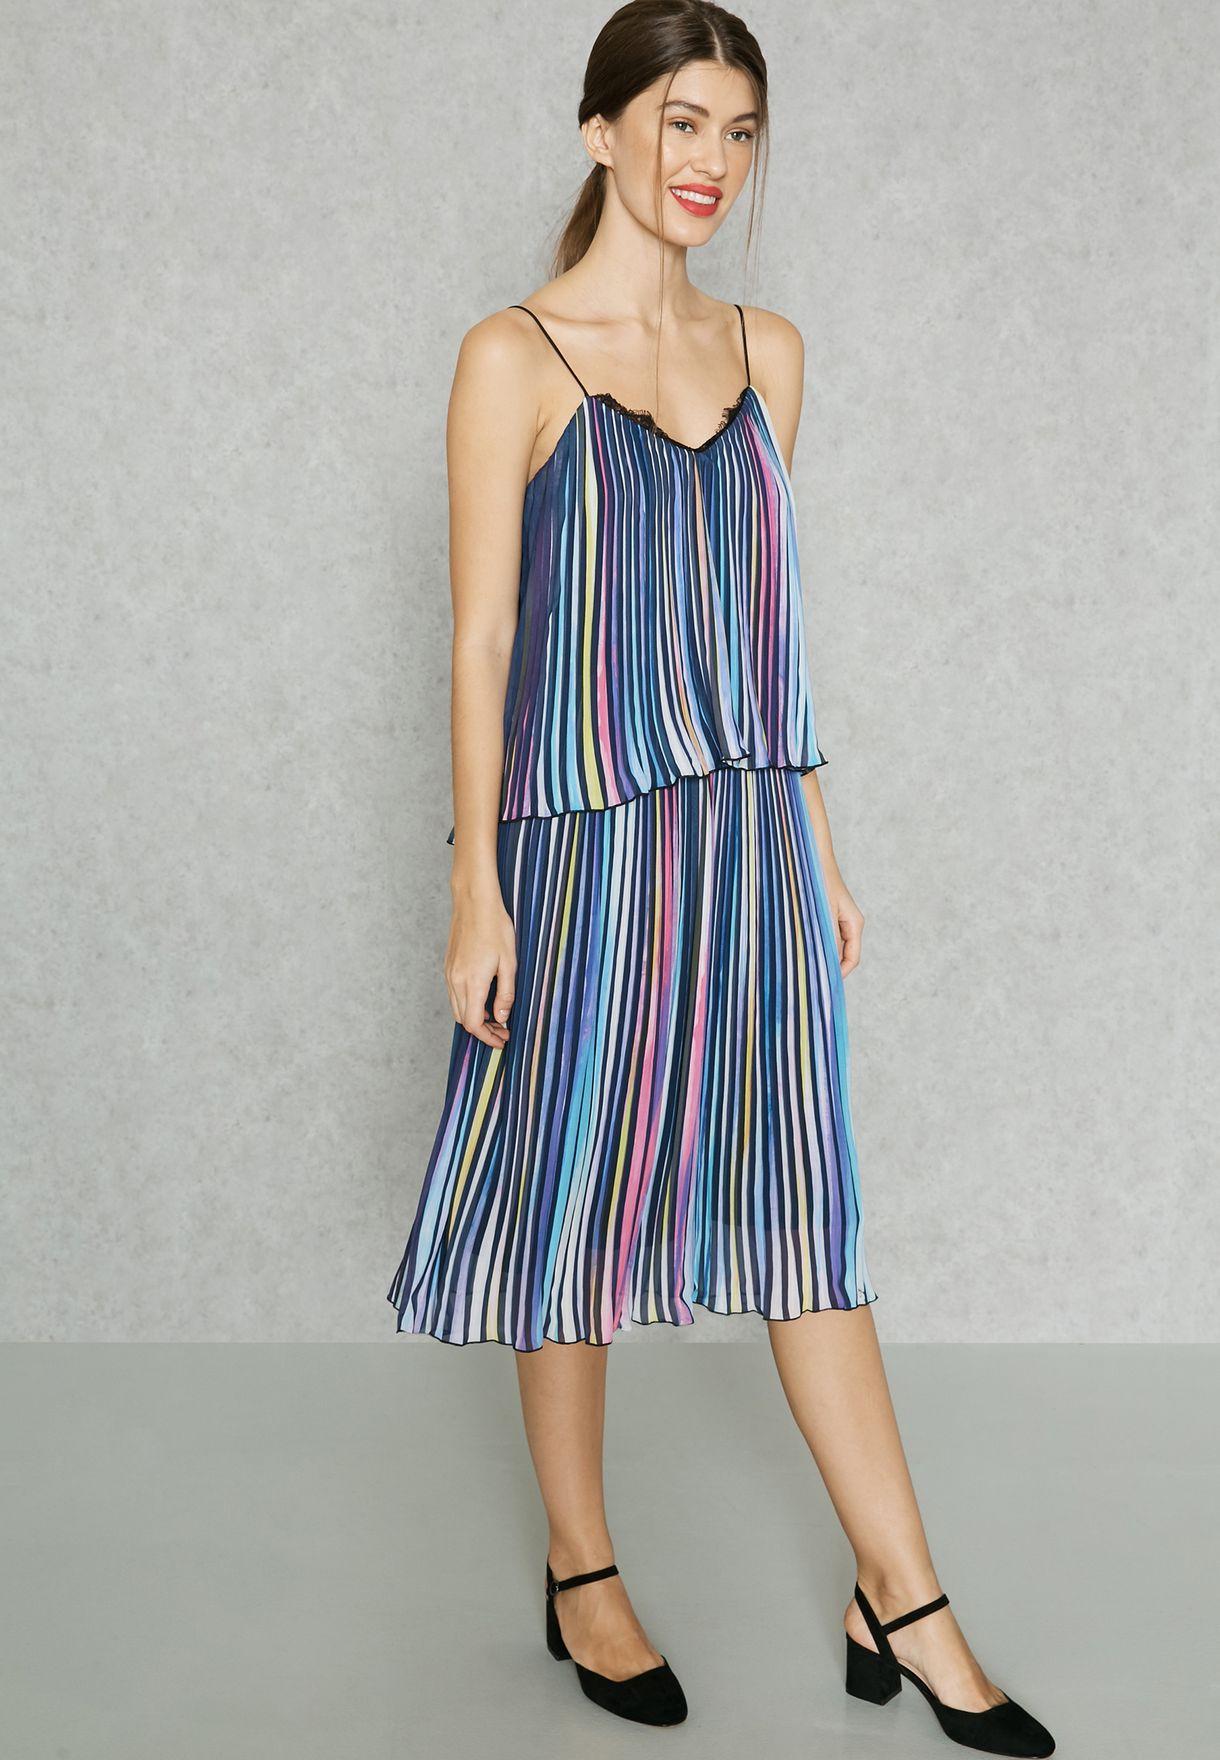 327d6b038e Shop Little White Lies multicolor Pleated Rainbow Stripe Overlay ...